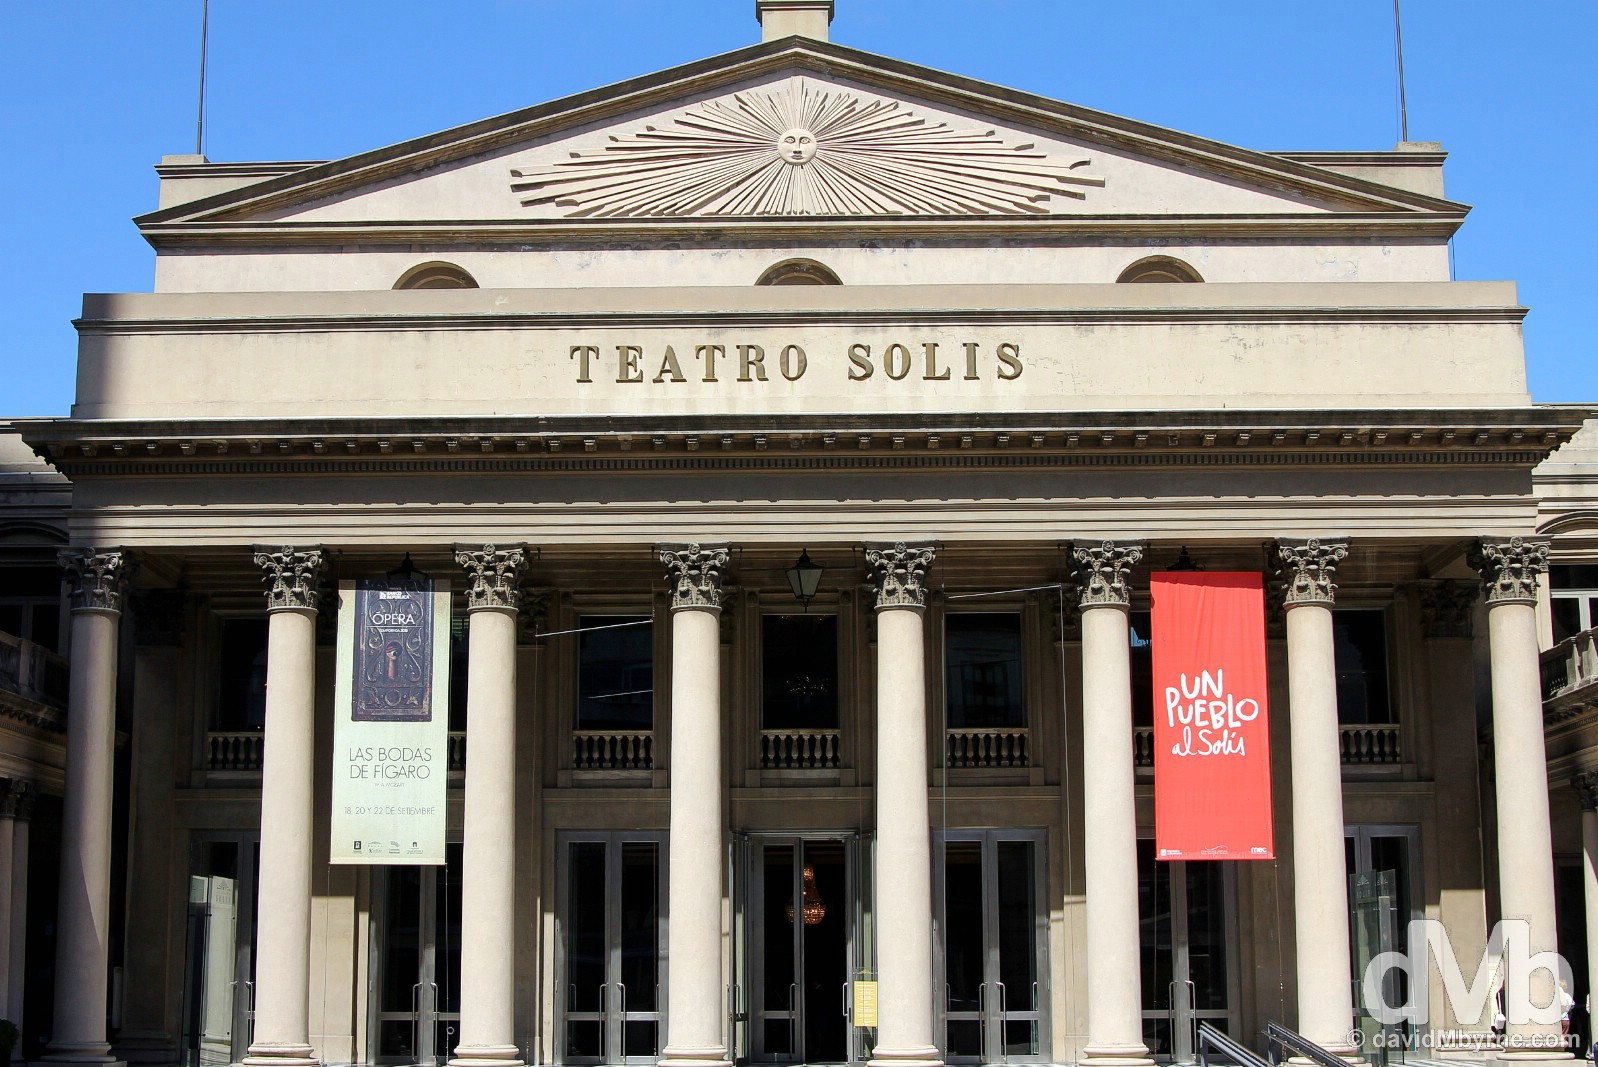 Teatro Solis, Montevideo, Uruguay. September 18, 2015.